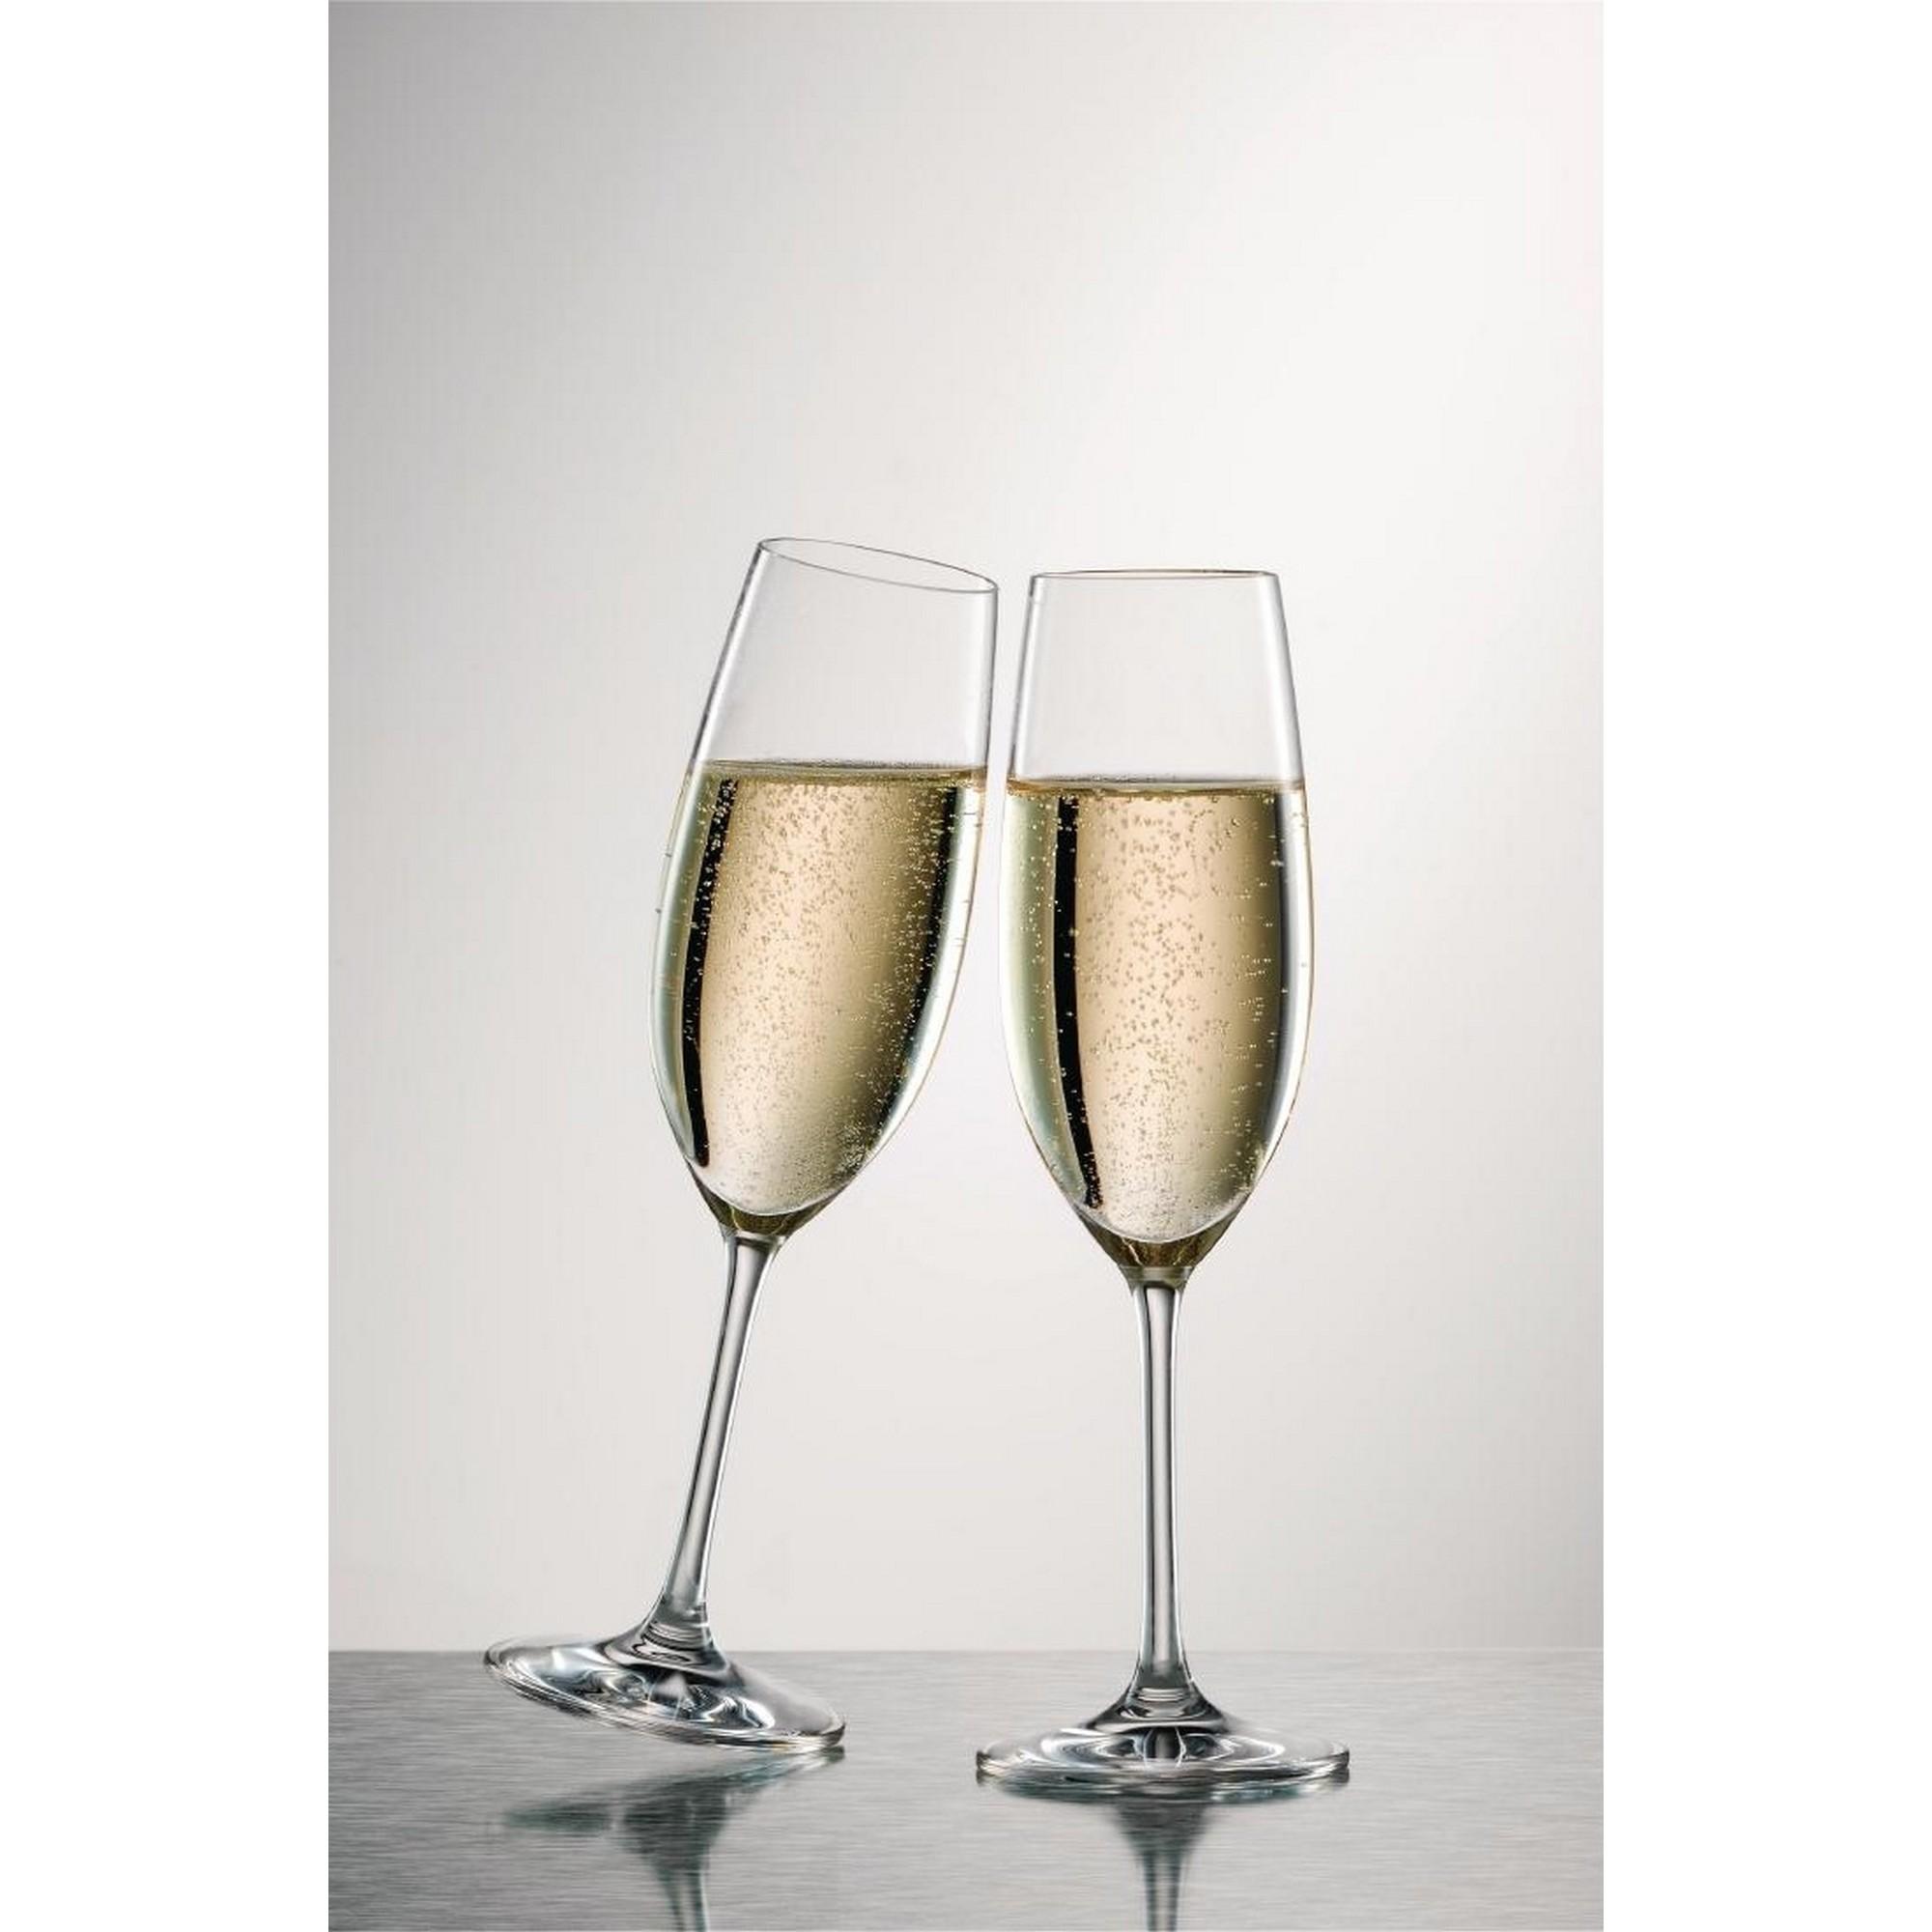 Taça para Champagne 228ml Schott Zwiesel Ivento 6 Peças de Cristal